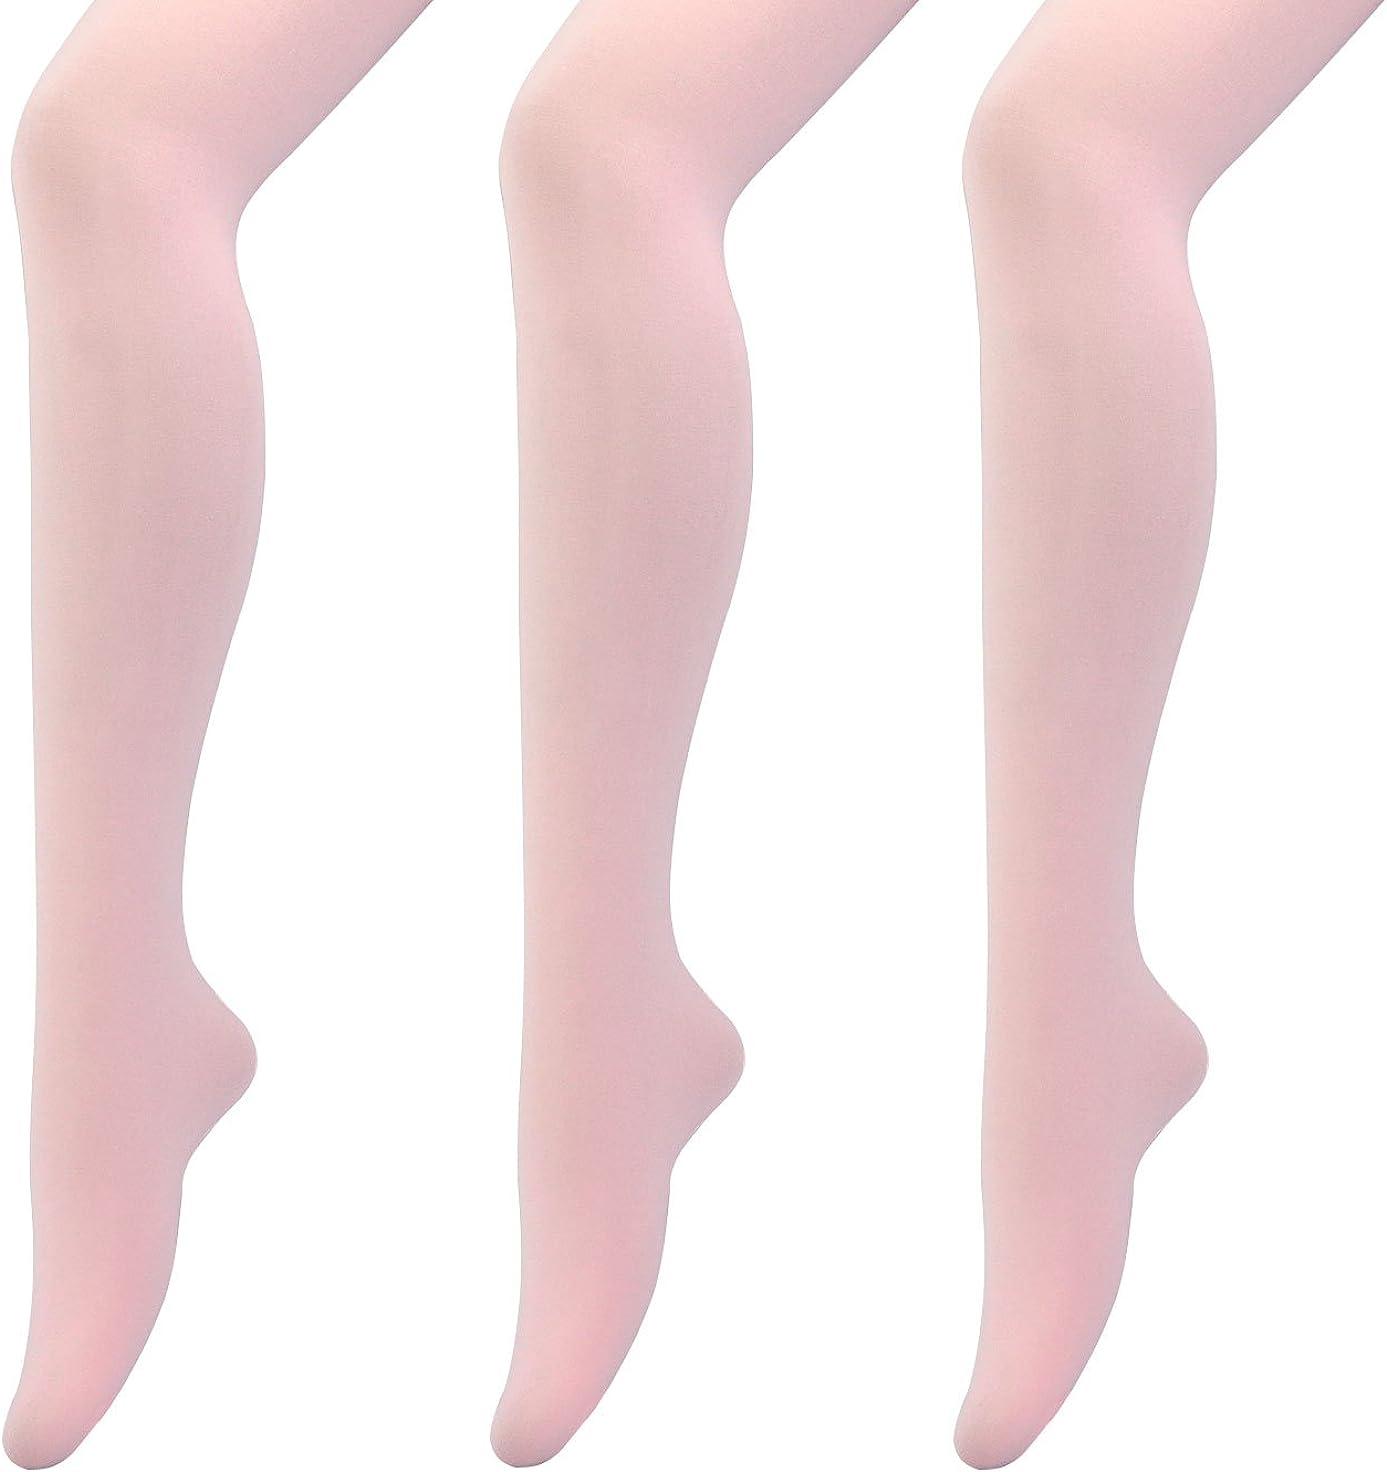 MANZI 3 Pairs Women's Girls' Basic Convertible Transition Ballet Dance Tights